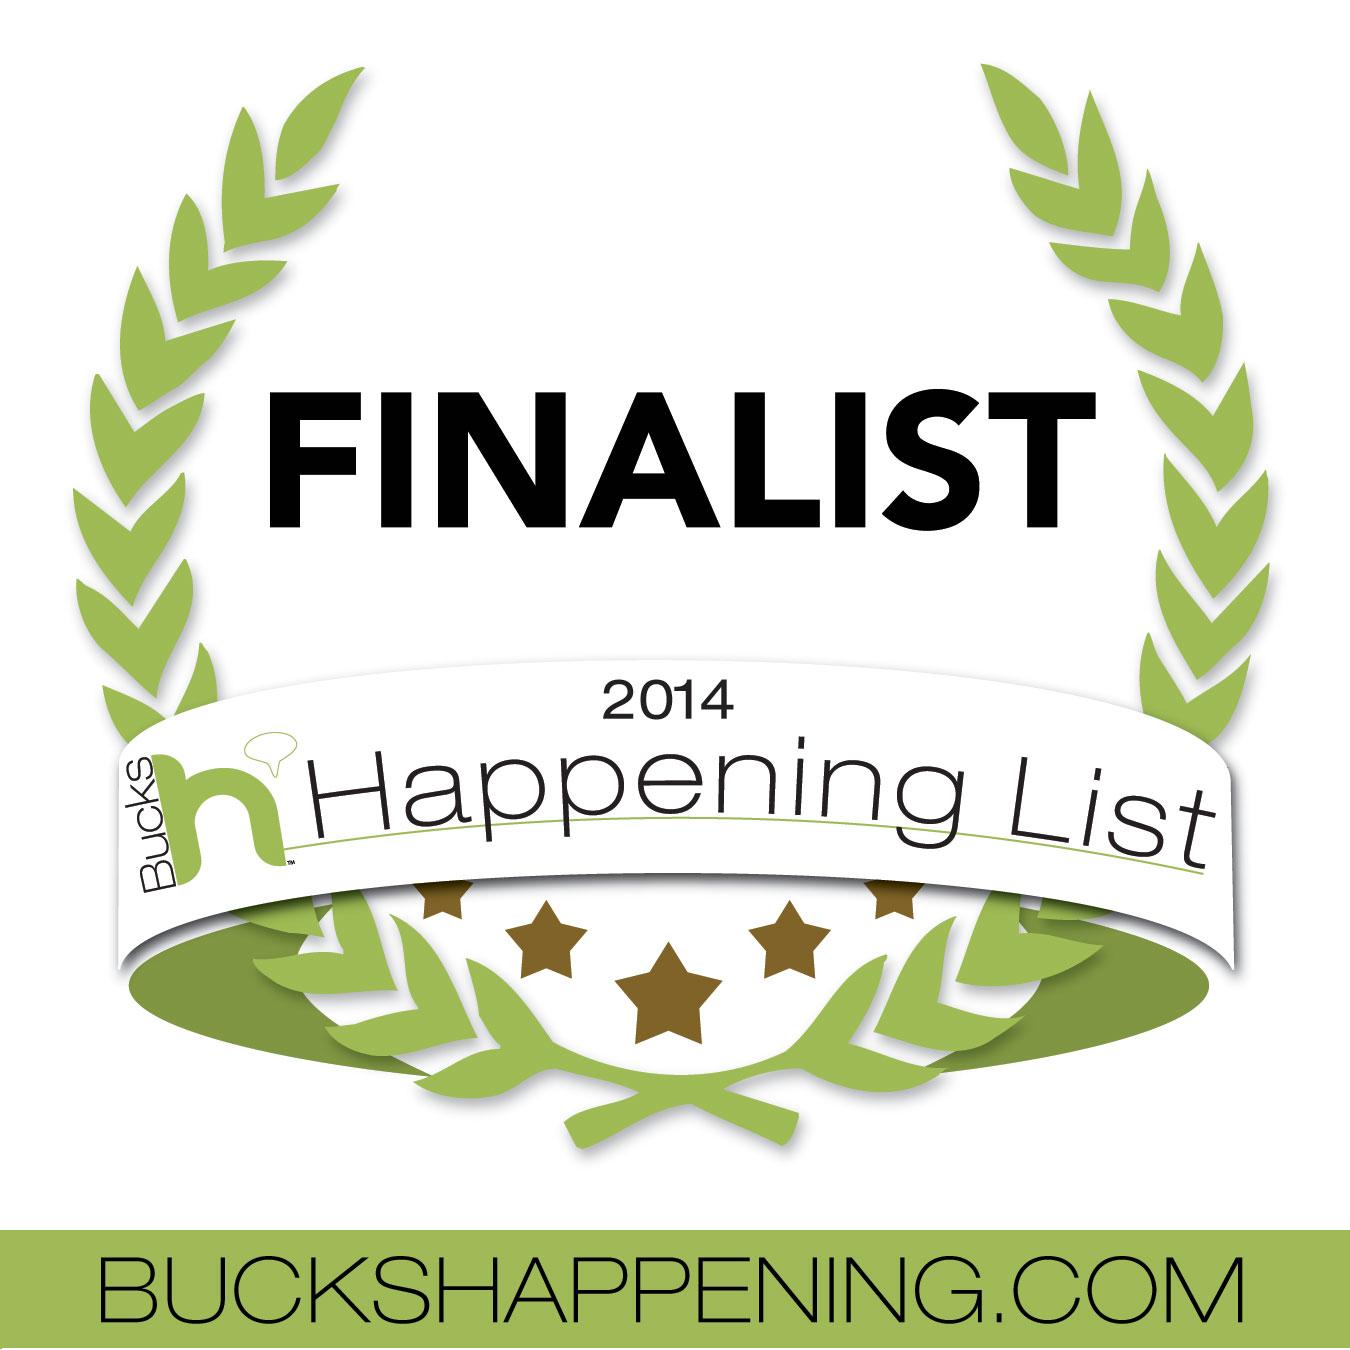 Bucks County Wedding Invitations | 2014 Bucks Happening List Finalist